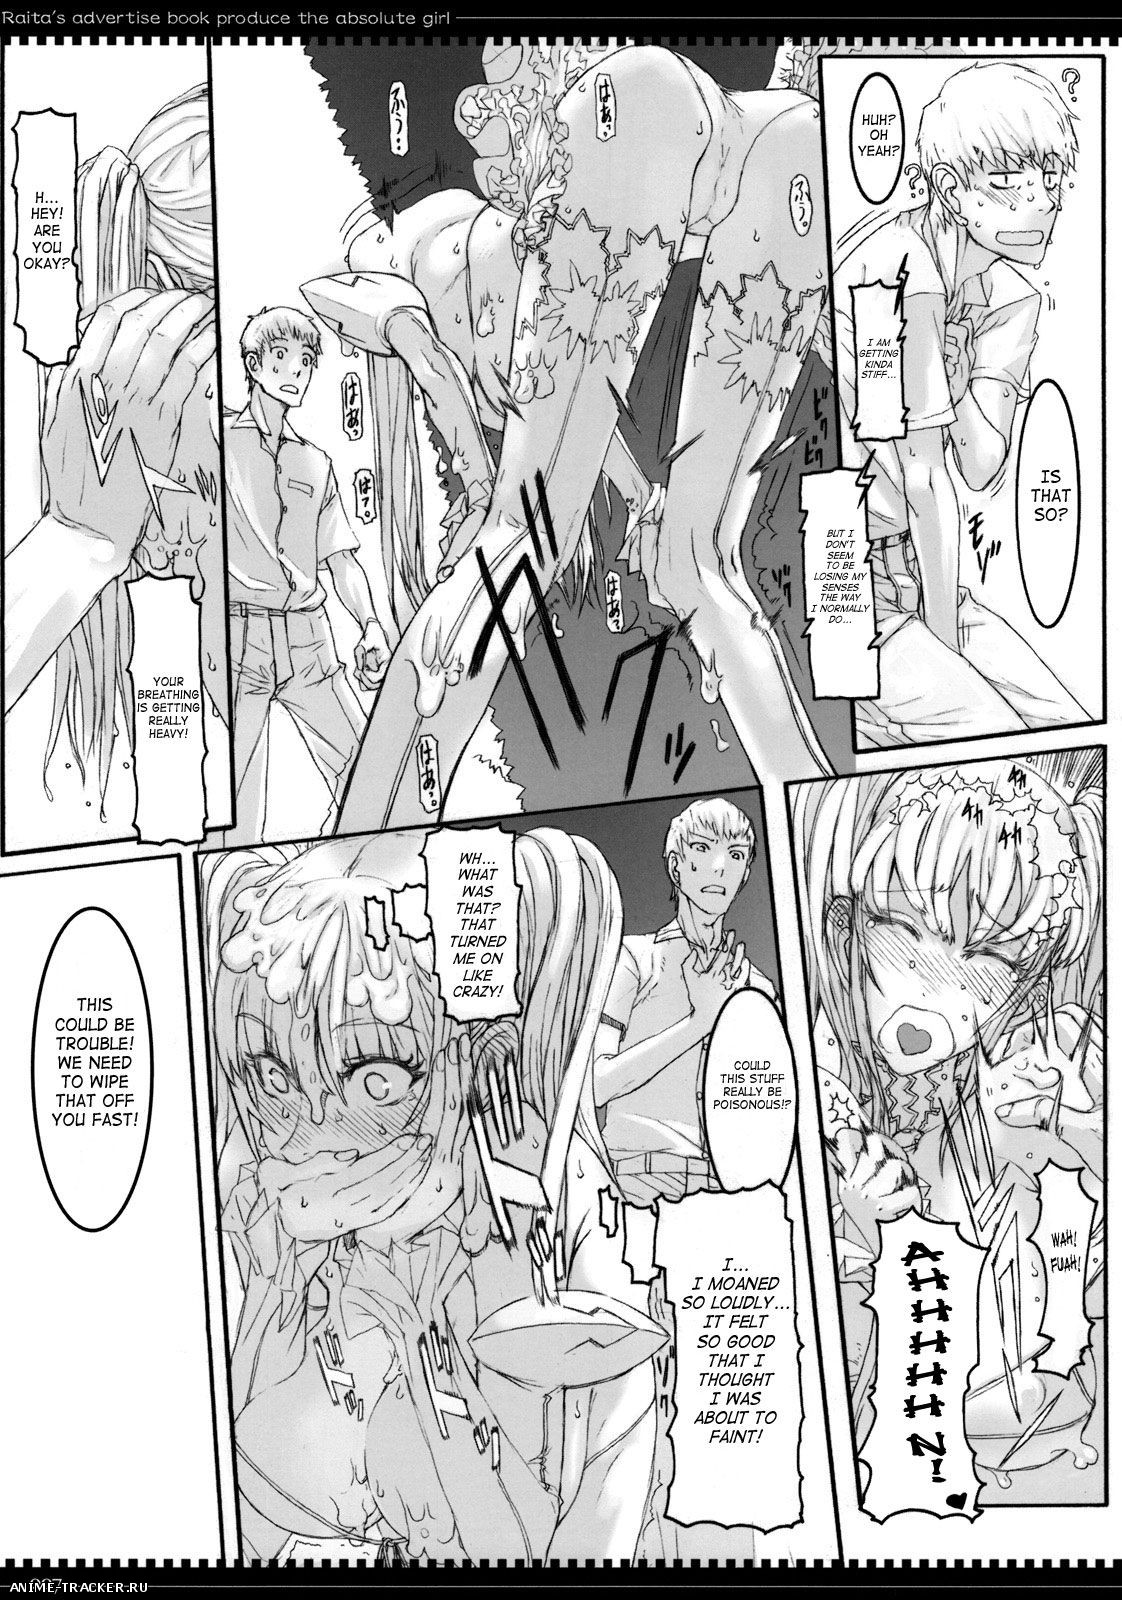 RAITA / ZETTAI SHOUJO — Сборник хентай манги [Ptcen] [JAP,ENG] Manga Hentai